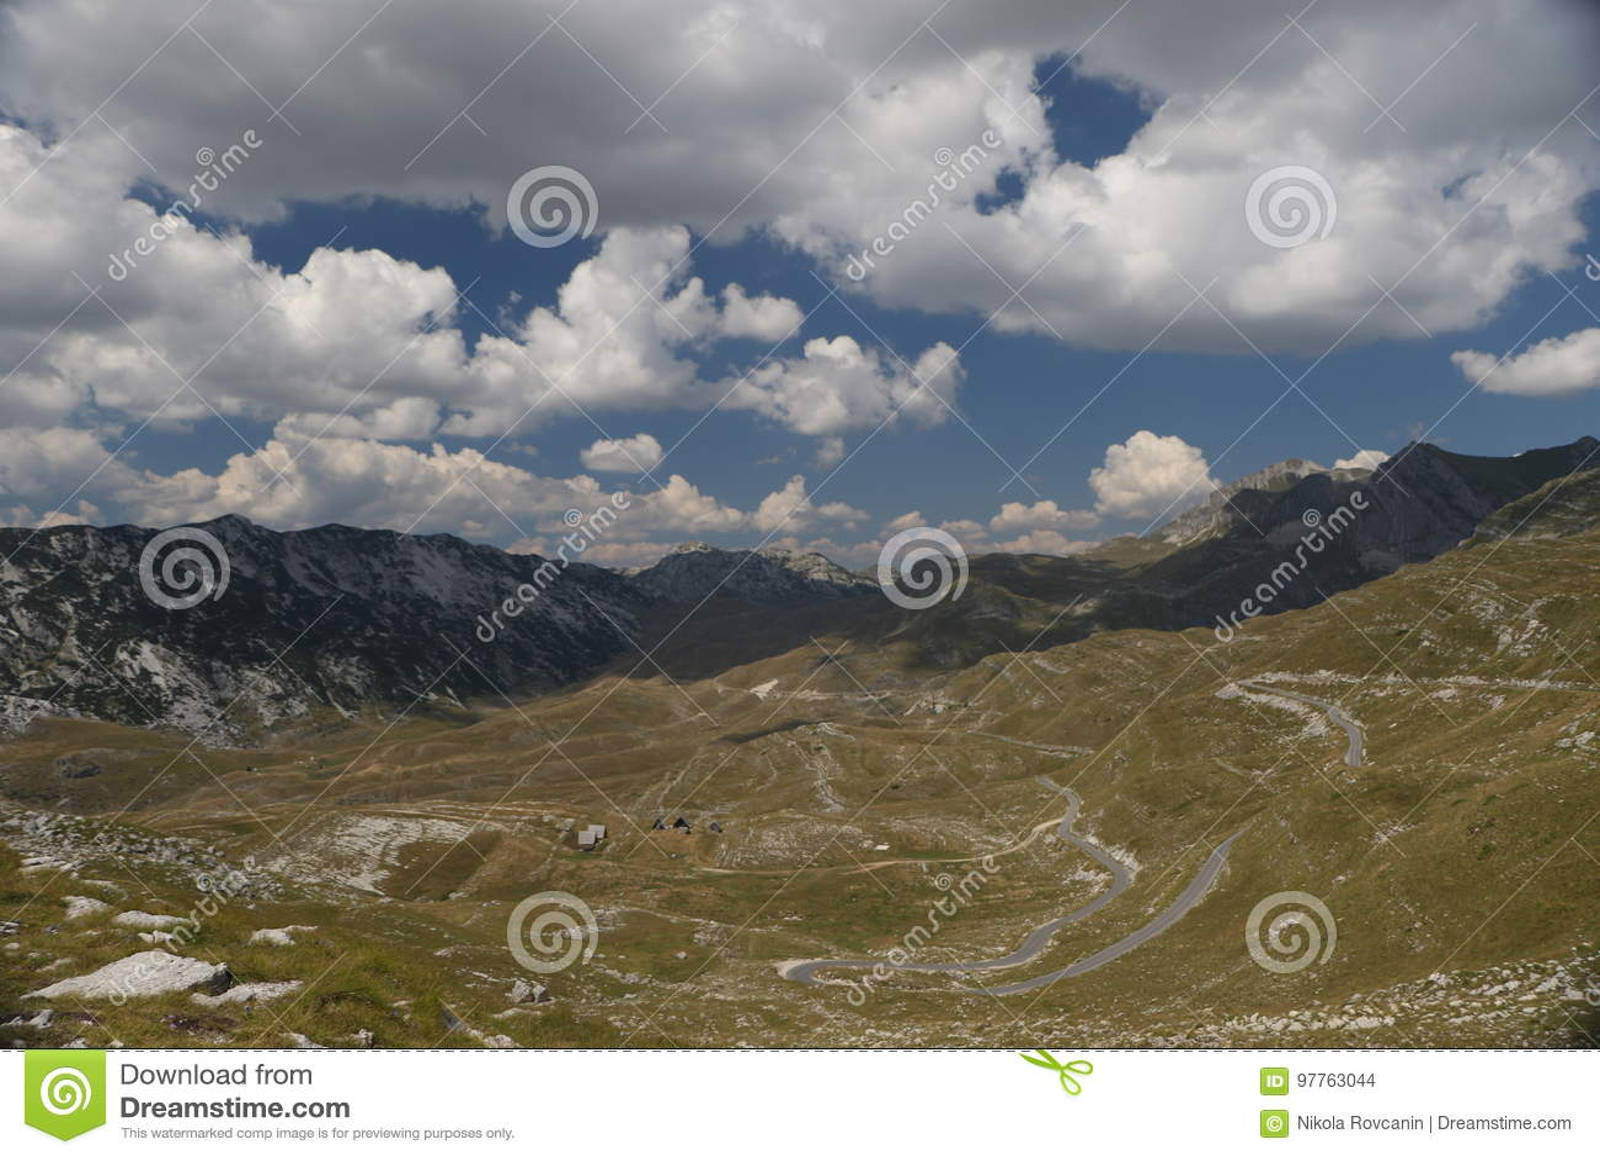 Mountain road Durmitor